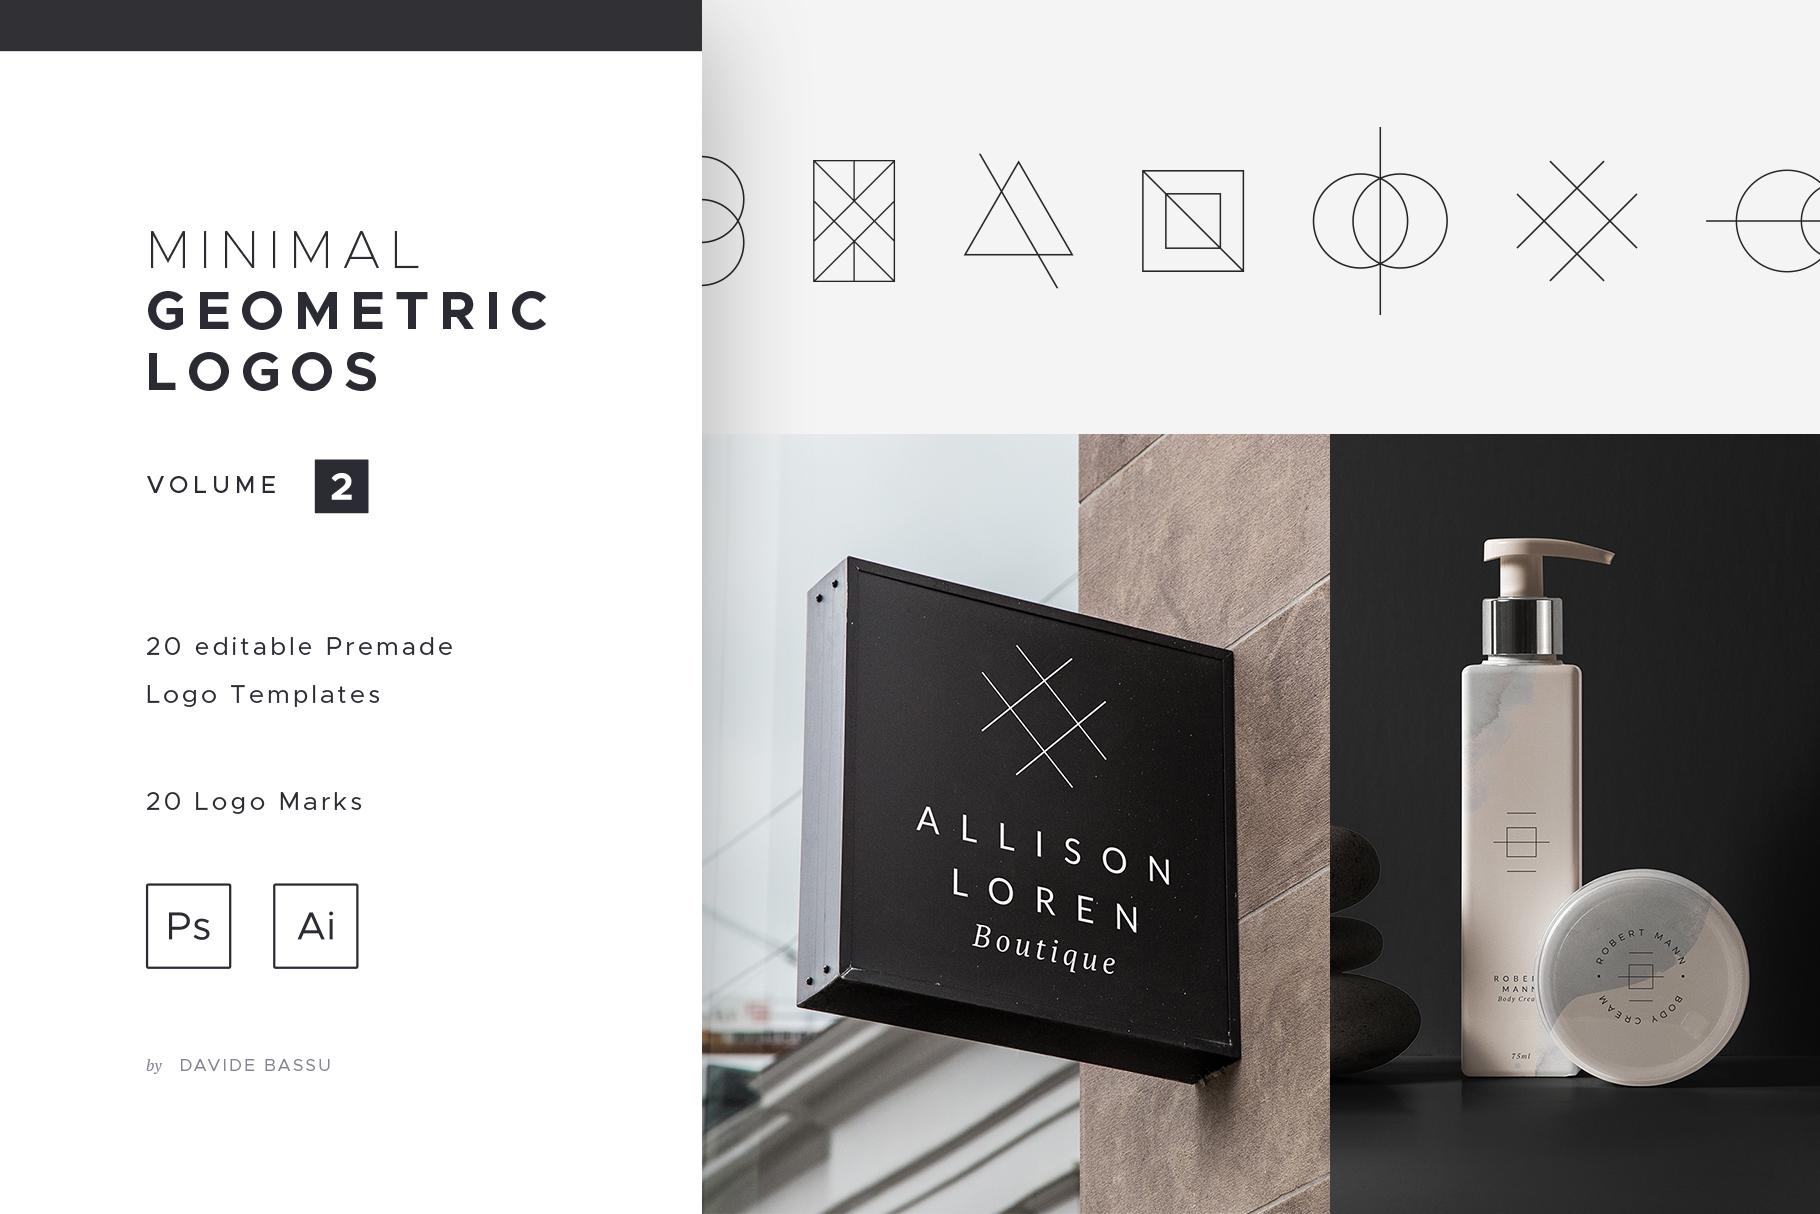 Minimal Geometric Logos - Volume 2 example image 1